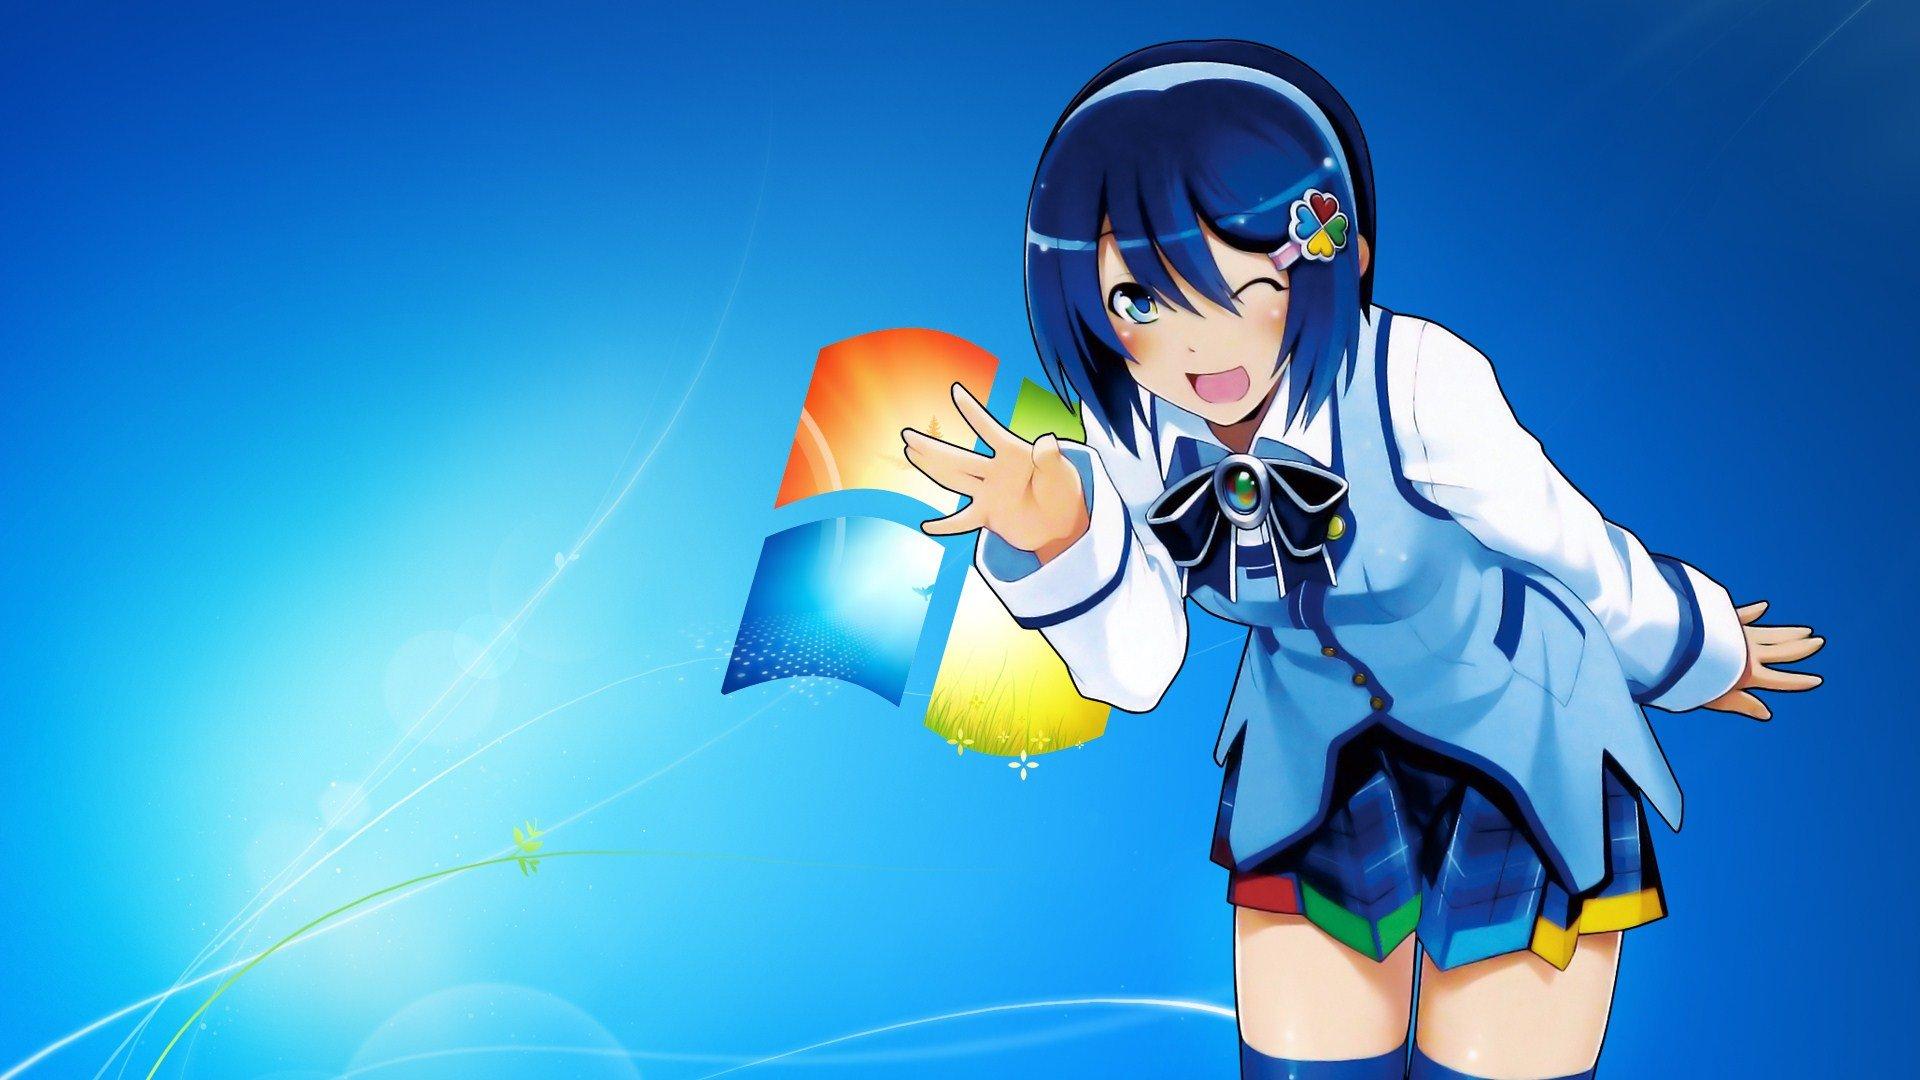 Windows 7 Cartoon Wallpapers 40 Wallpapers Adorable